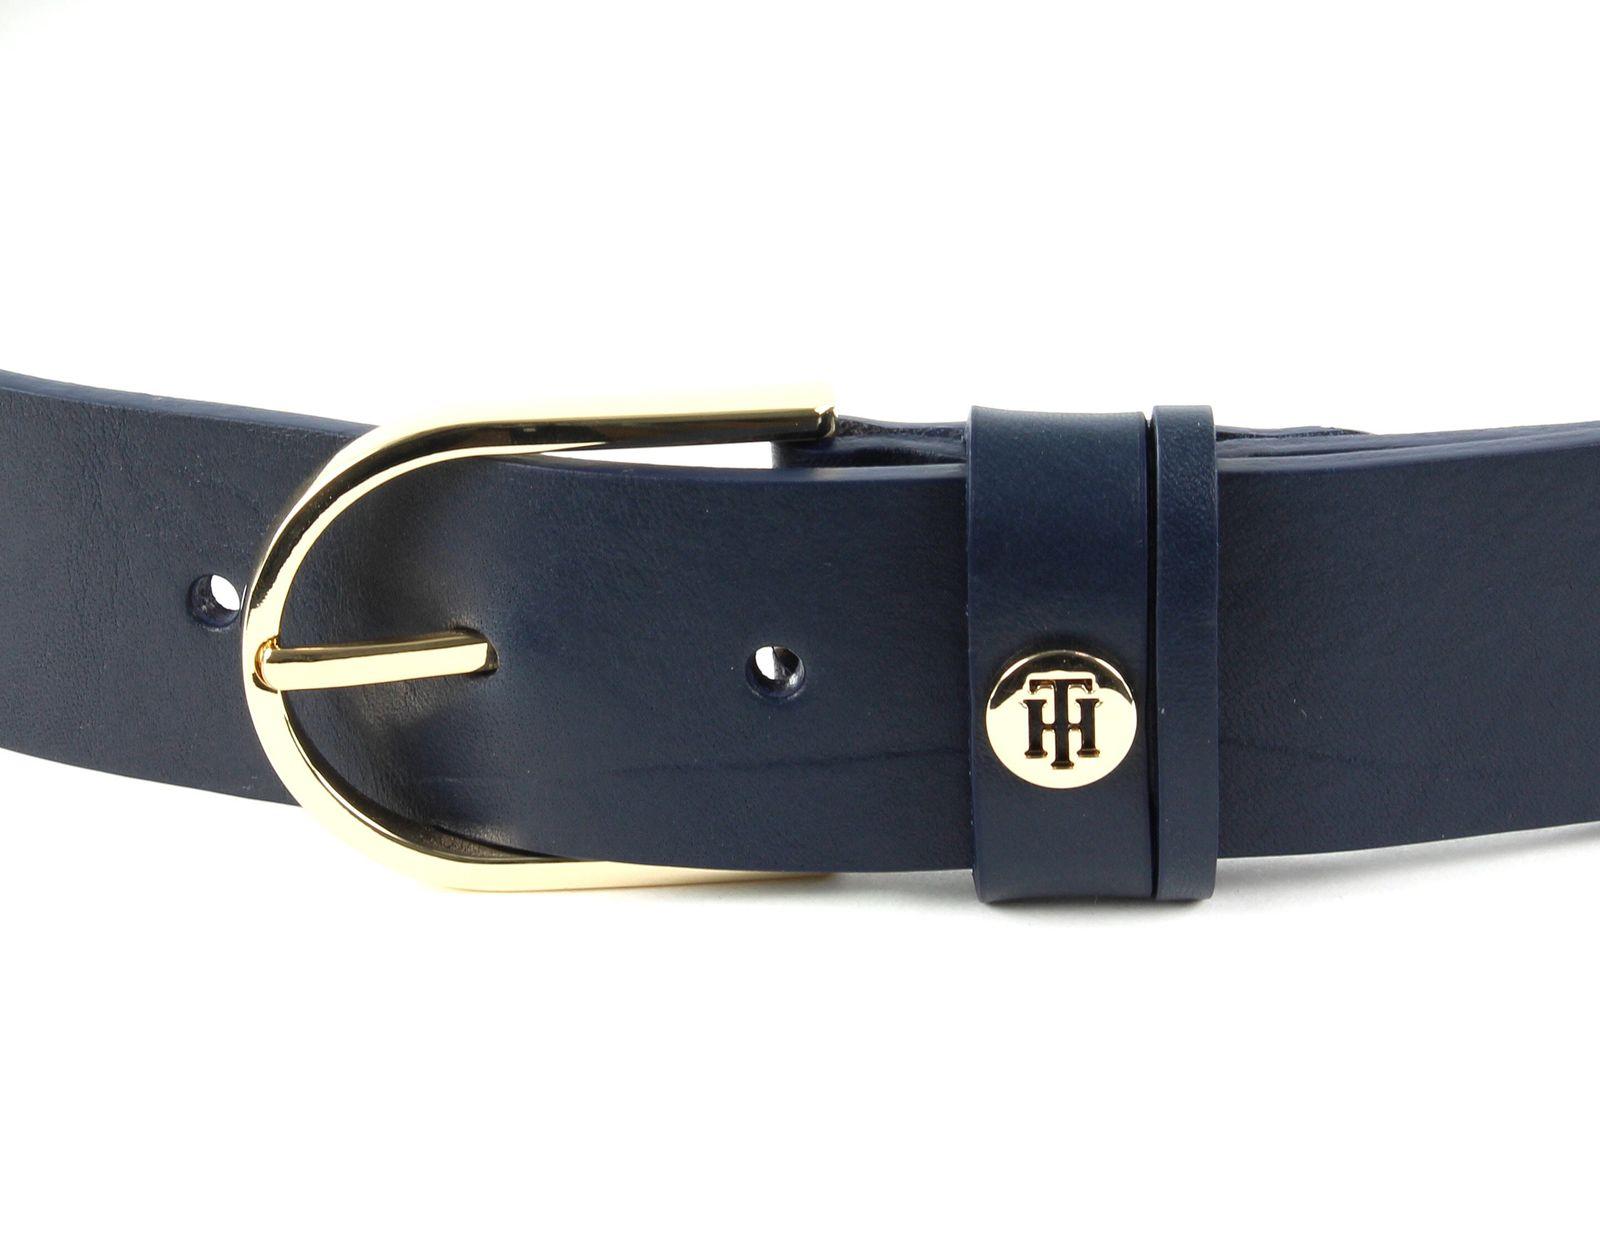 TOMMY HILFIGER Classic Belt 3.5 W100 Gürtel Accessoire Sky Captain Blau Neu